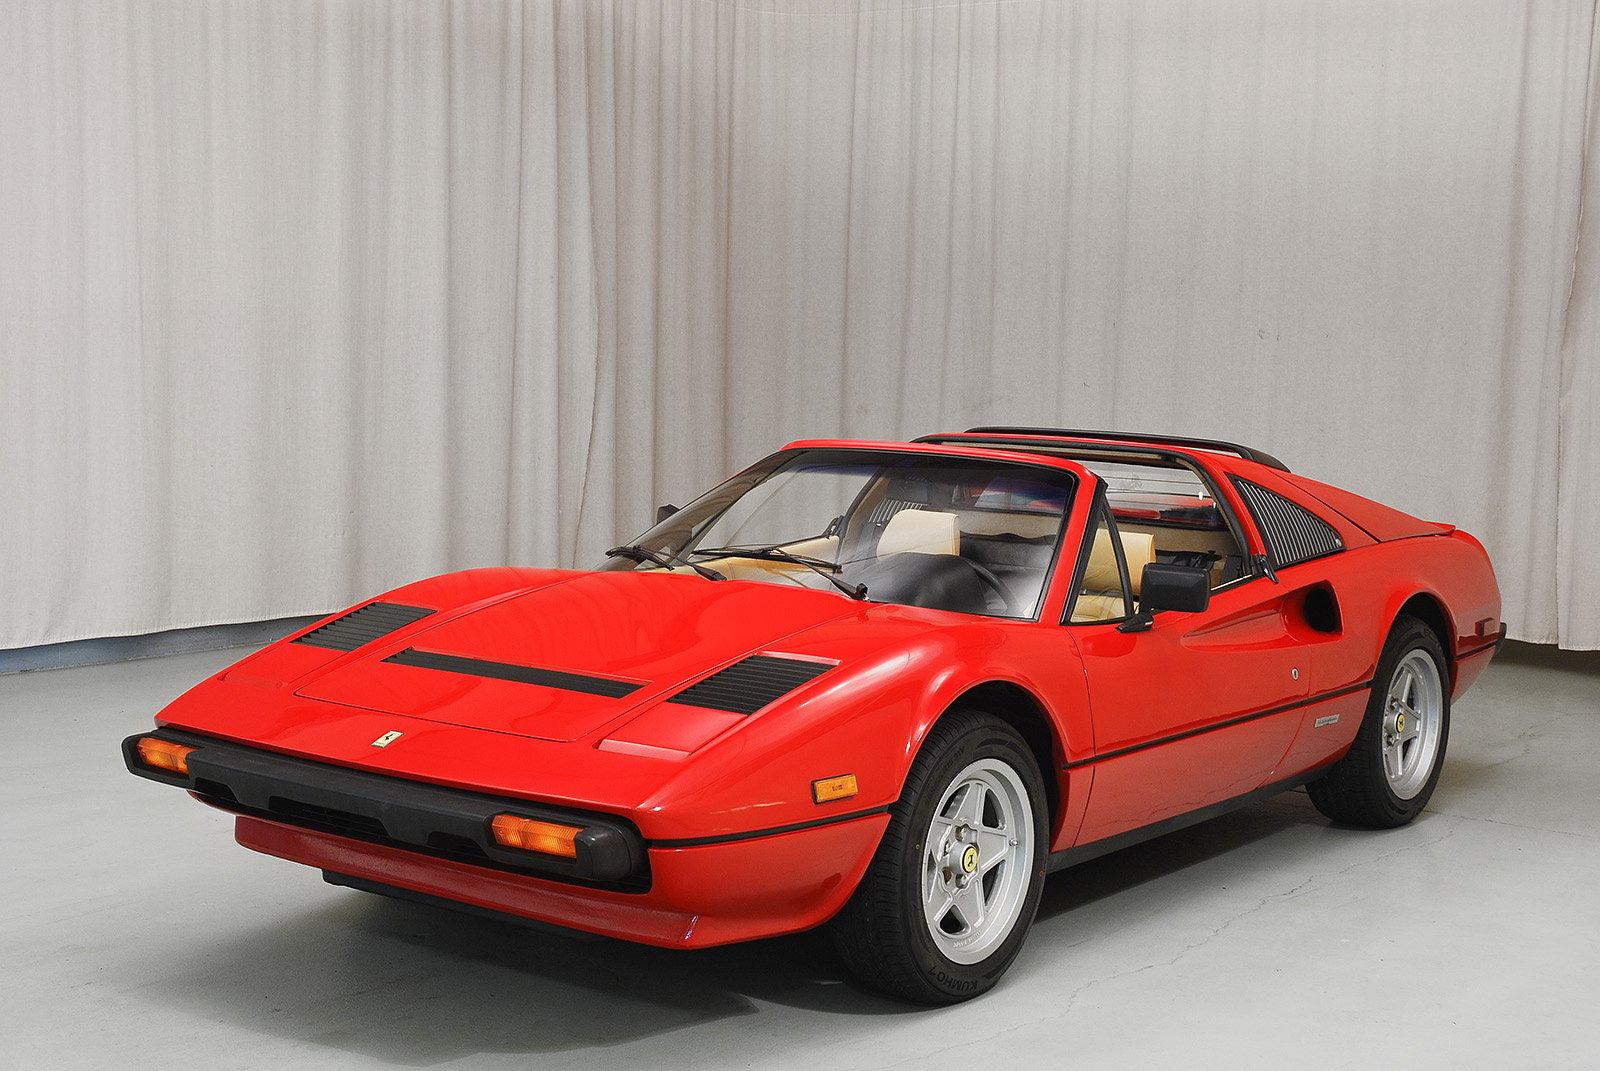 1985 ferrari 308 gts qv convertible hyman ltd classic cars. Black Bedroom Furniture Sets. Home Design Ideas